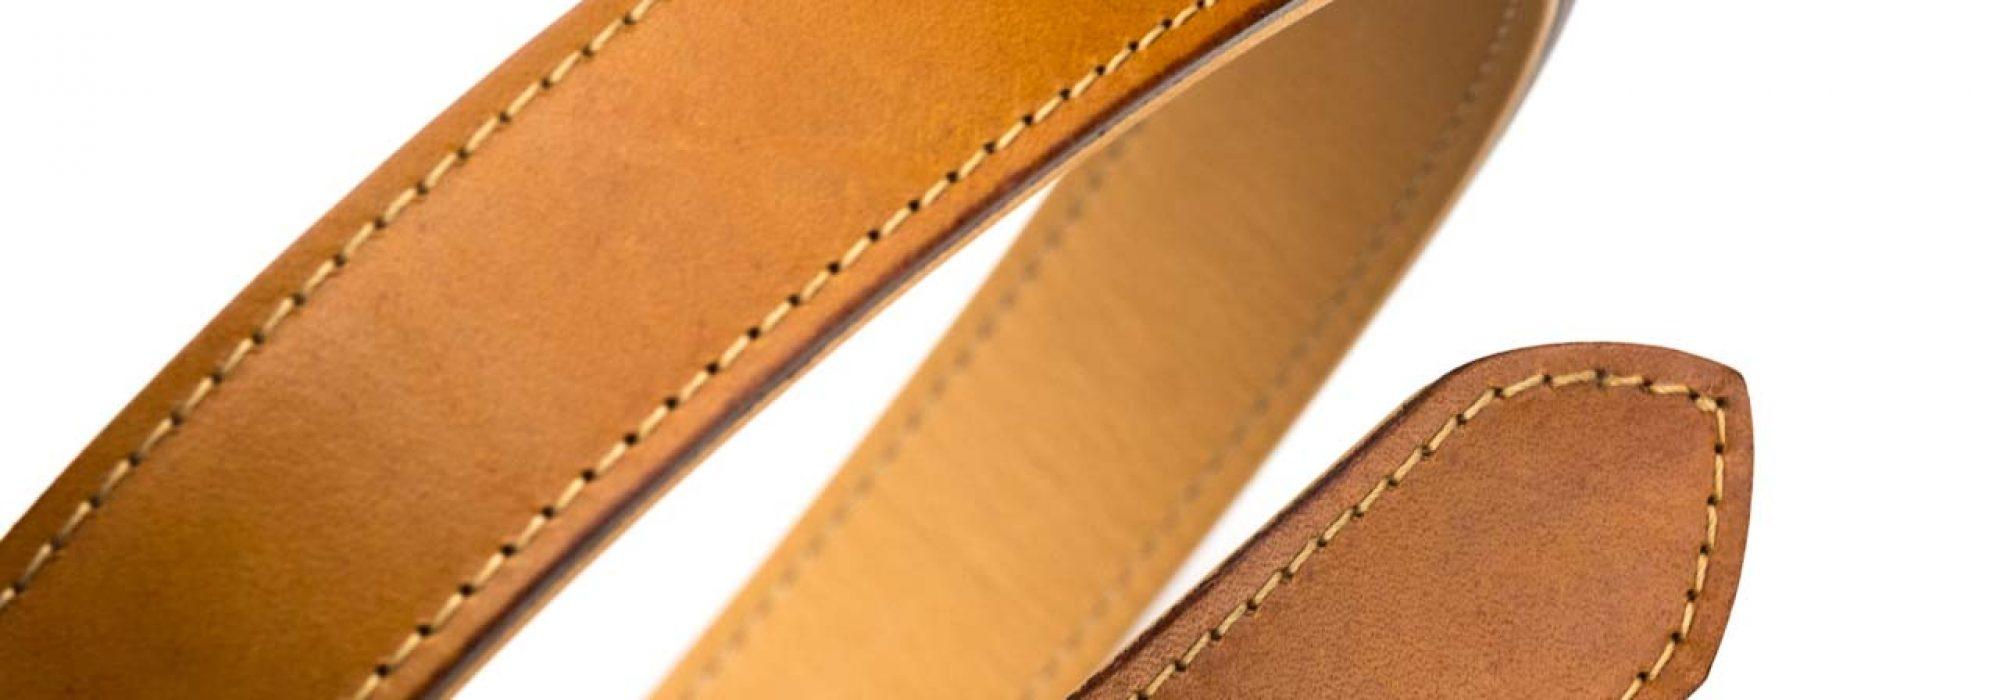 Ferrum and Hide Ltd. j and fj baker full grain london tan belt strap